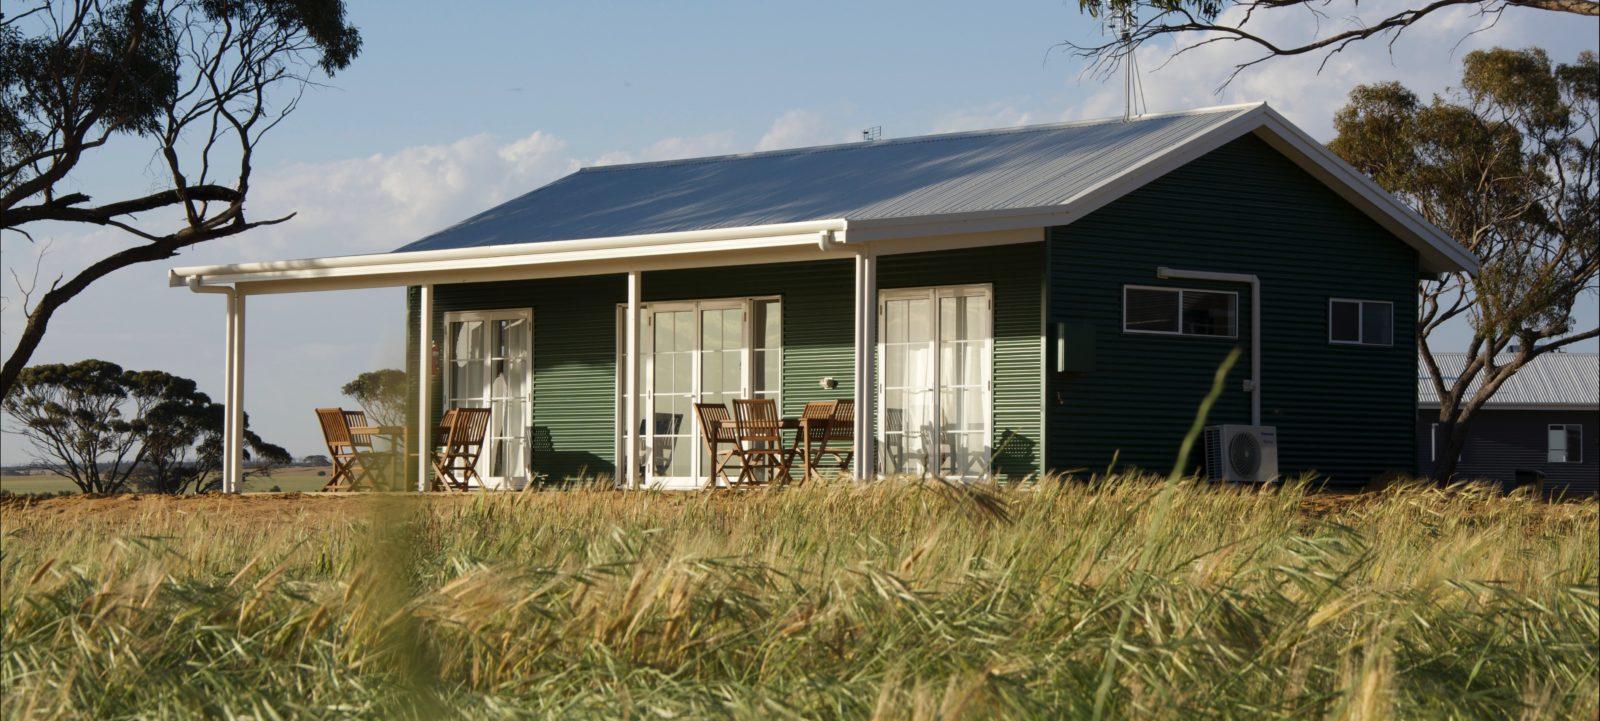 Mary's Farm Cottages, Kukerin, Western Australia